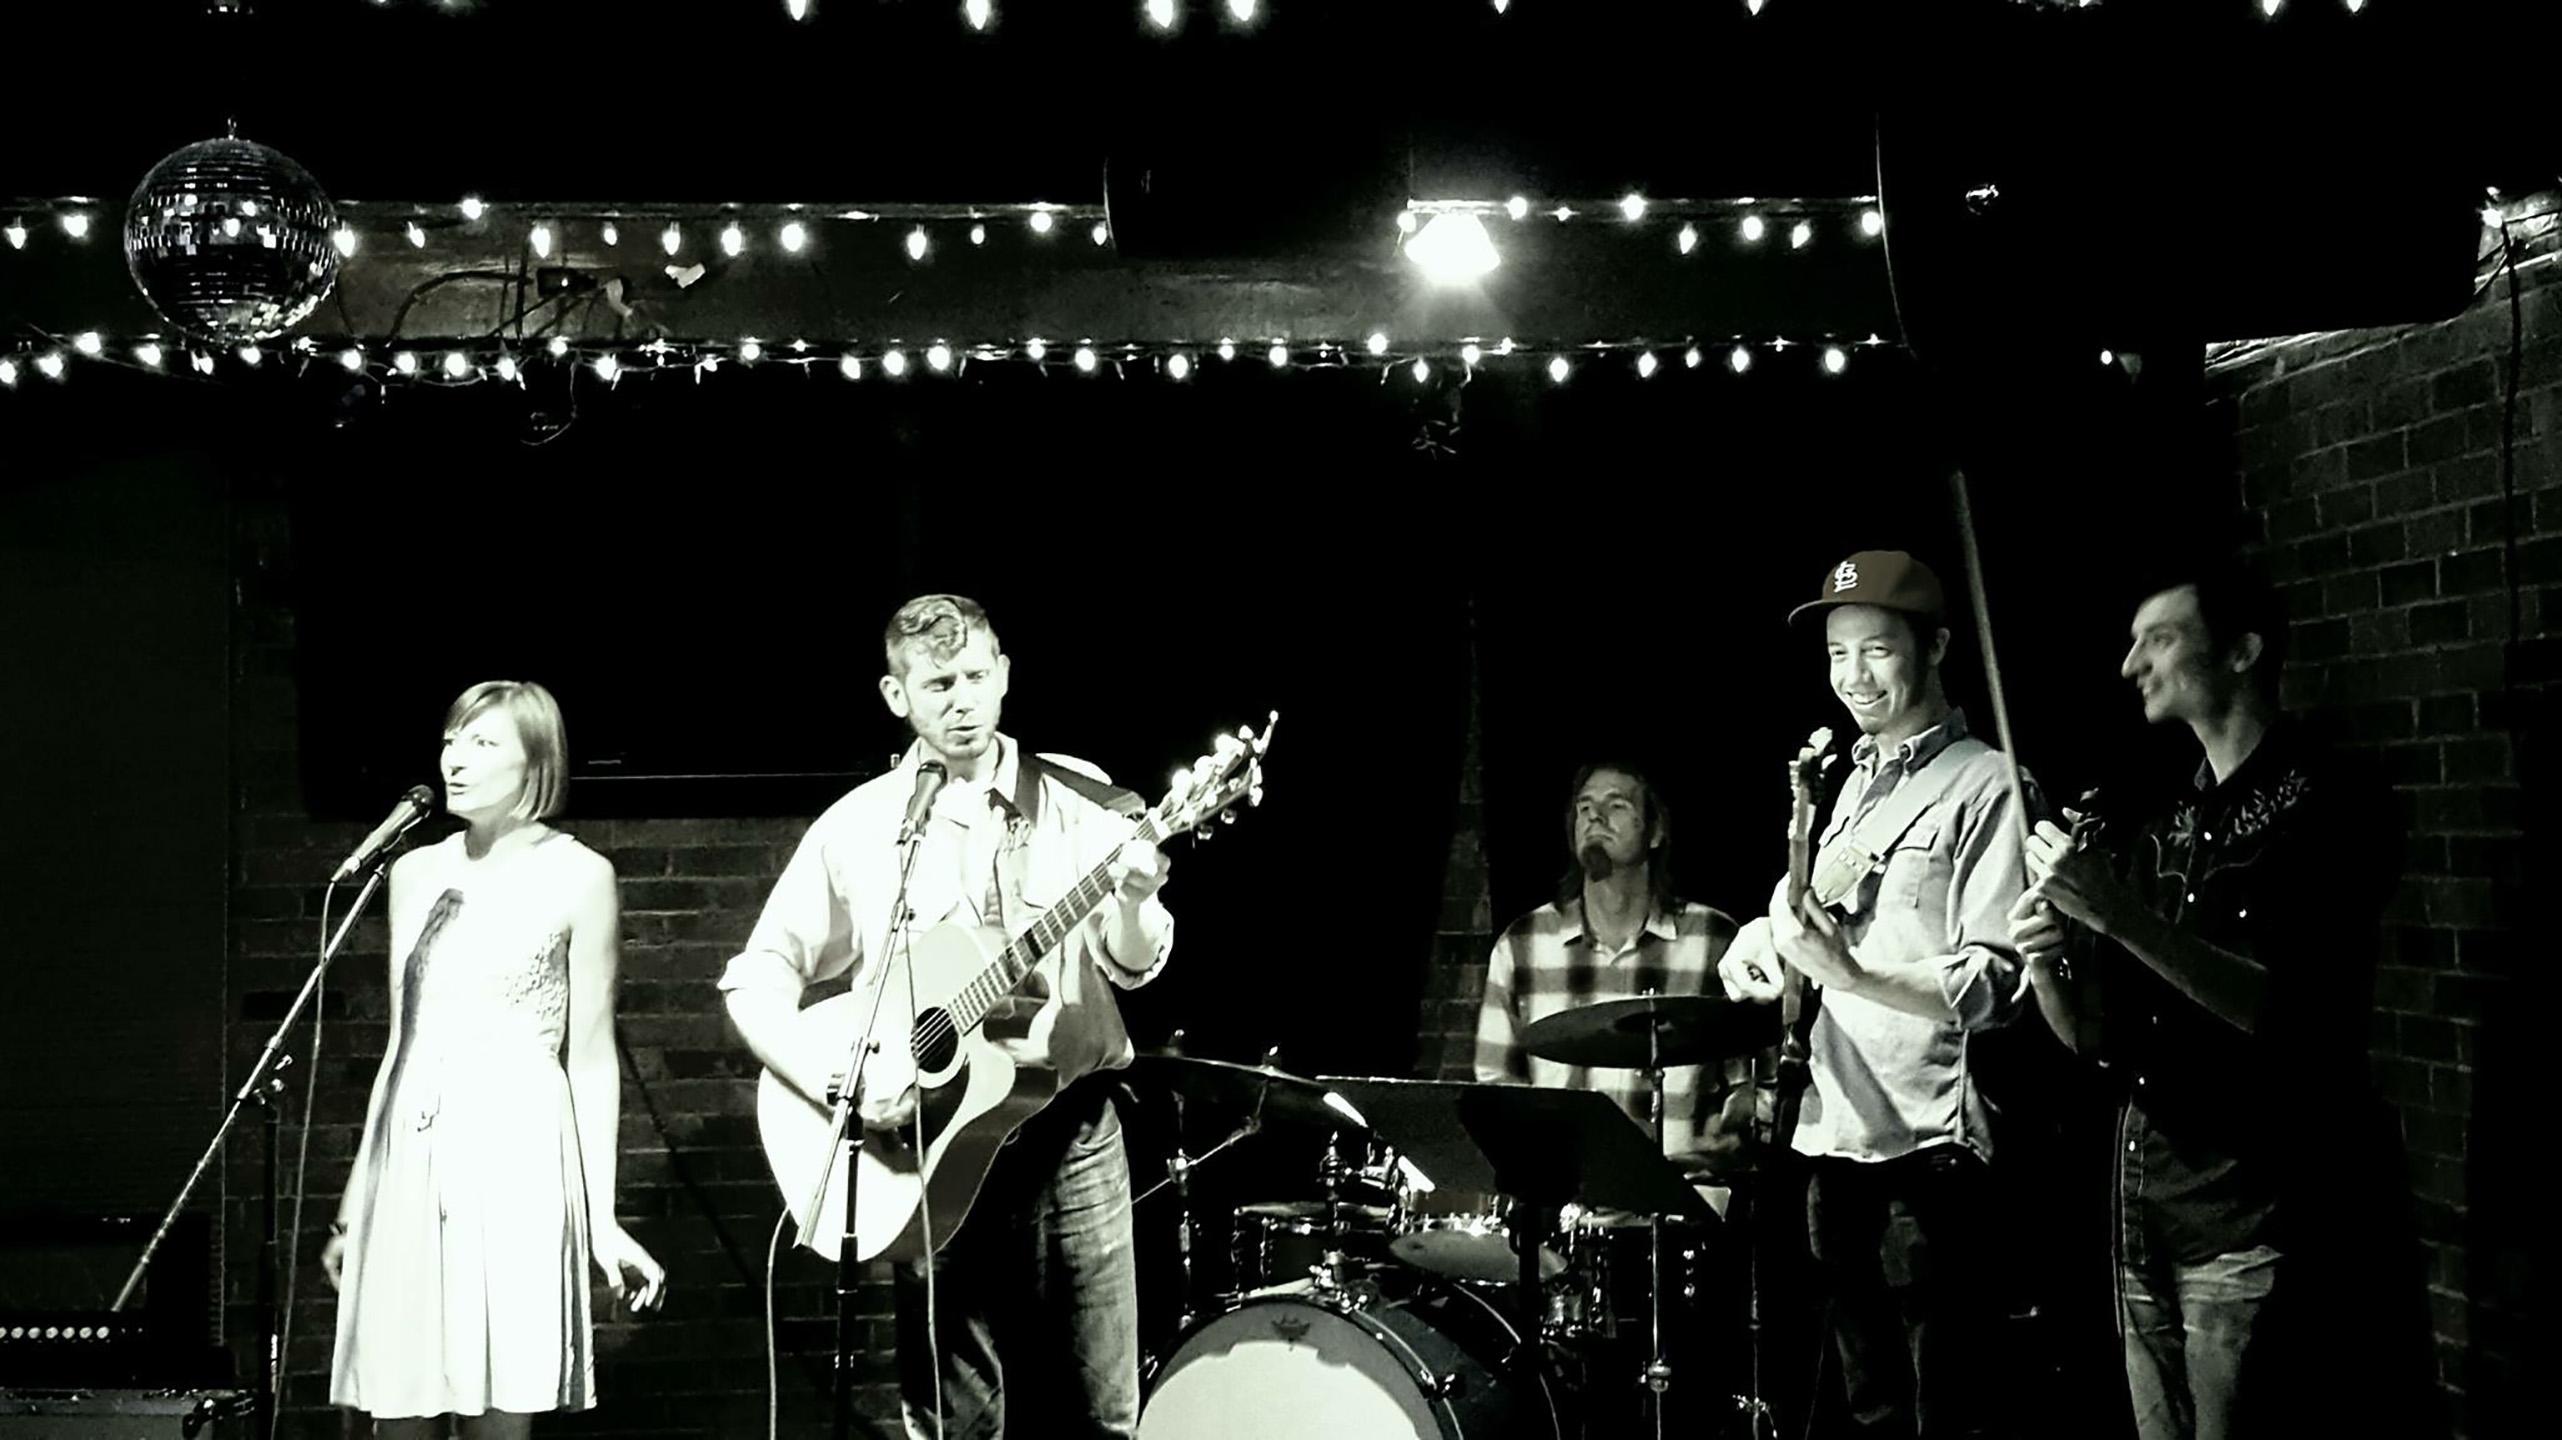 5X Beaver performing @ The Night Owl